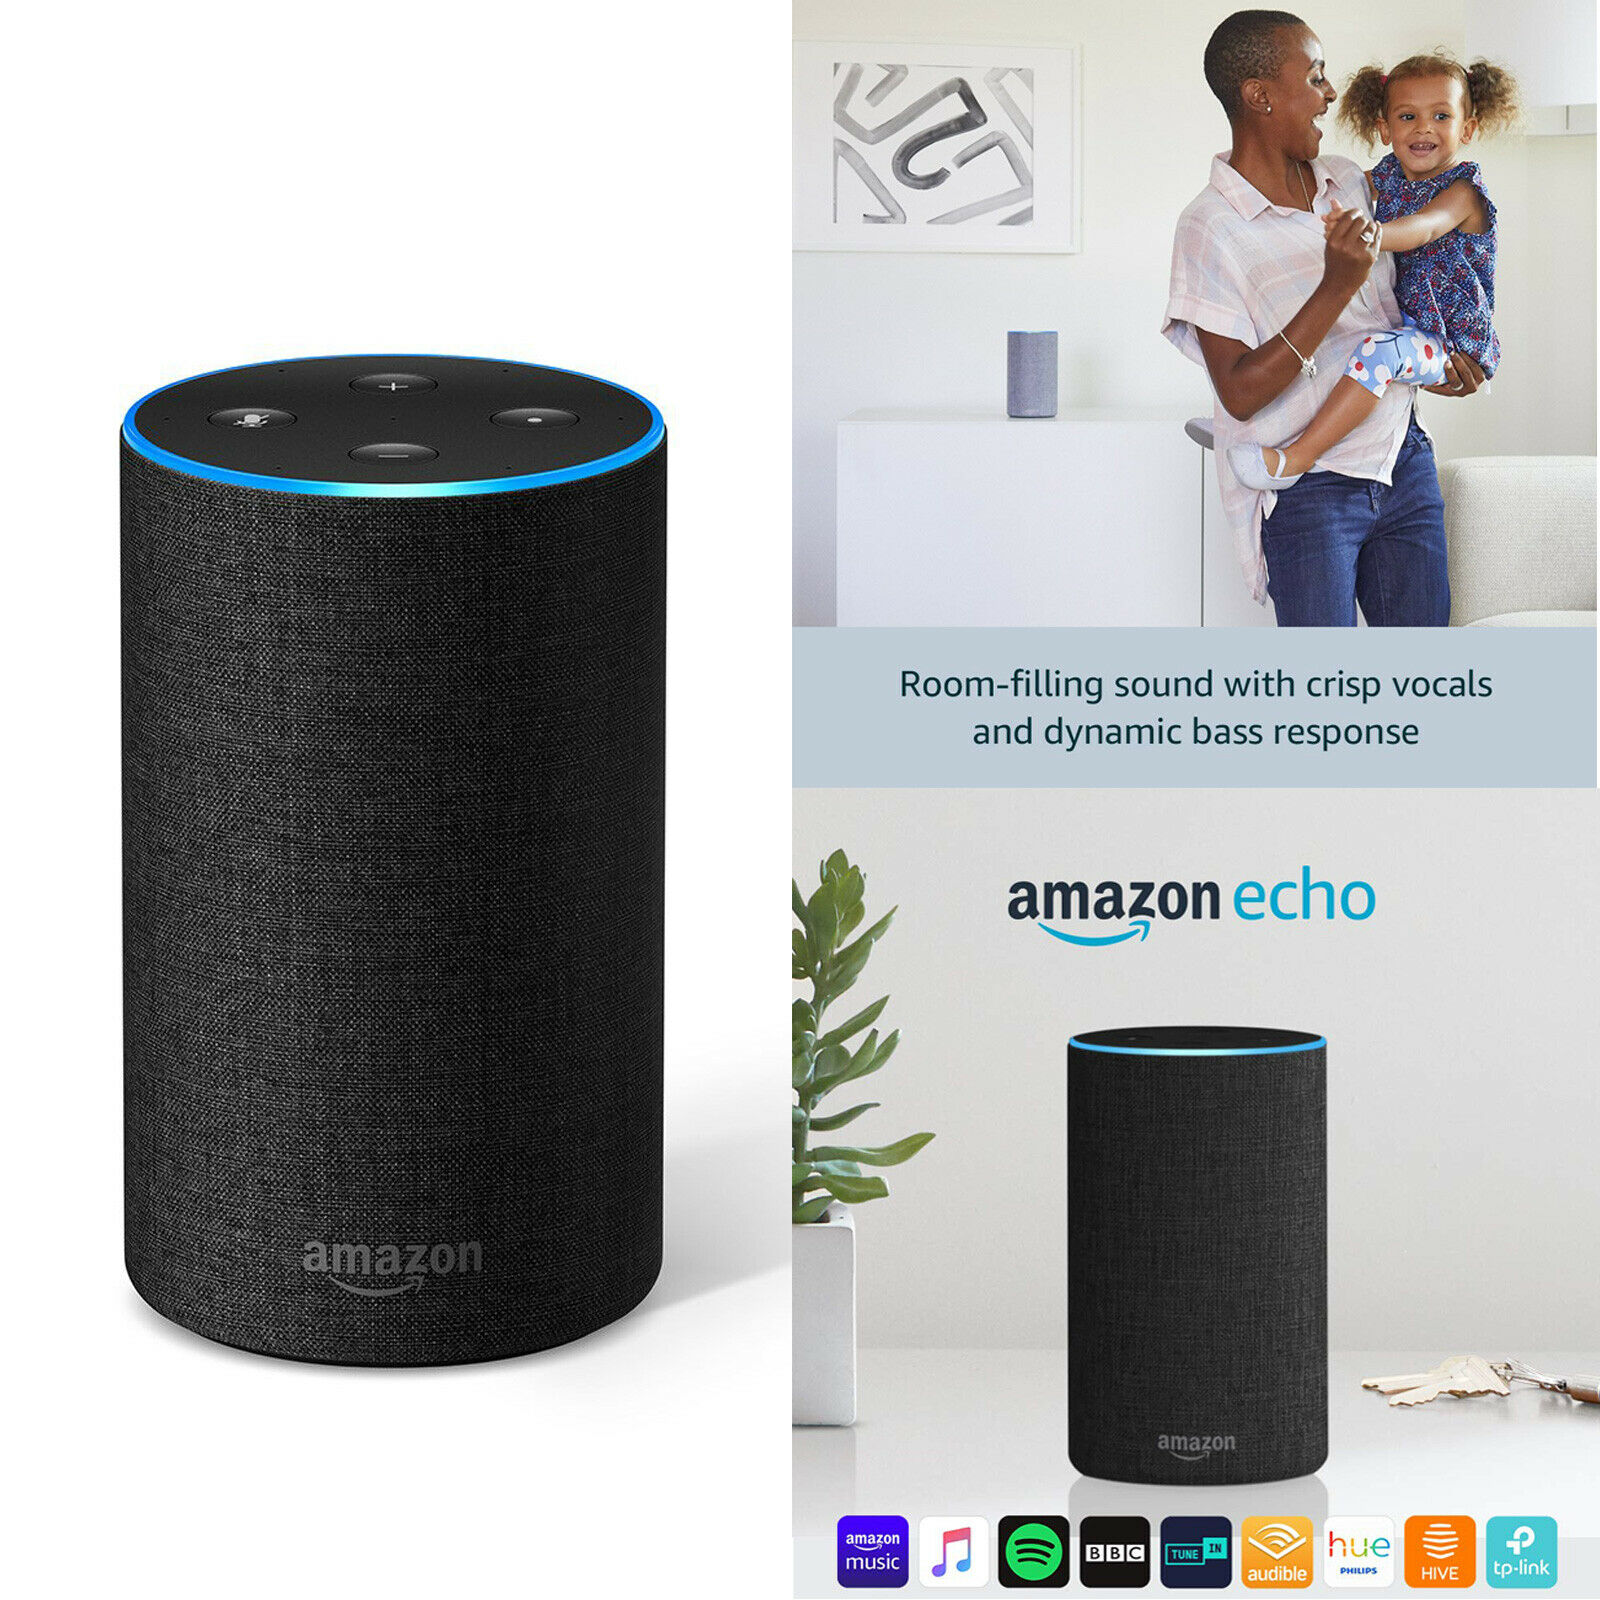 Amazon Echo 2nd Generation Kabellos Alexa Blautooth Lautsprecher - Dunkelgrau